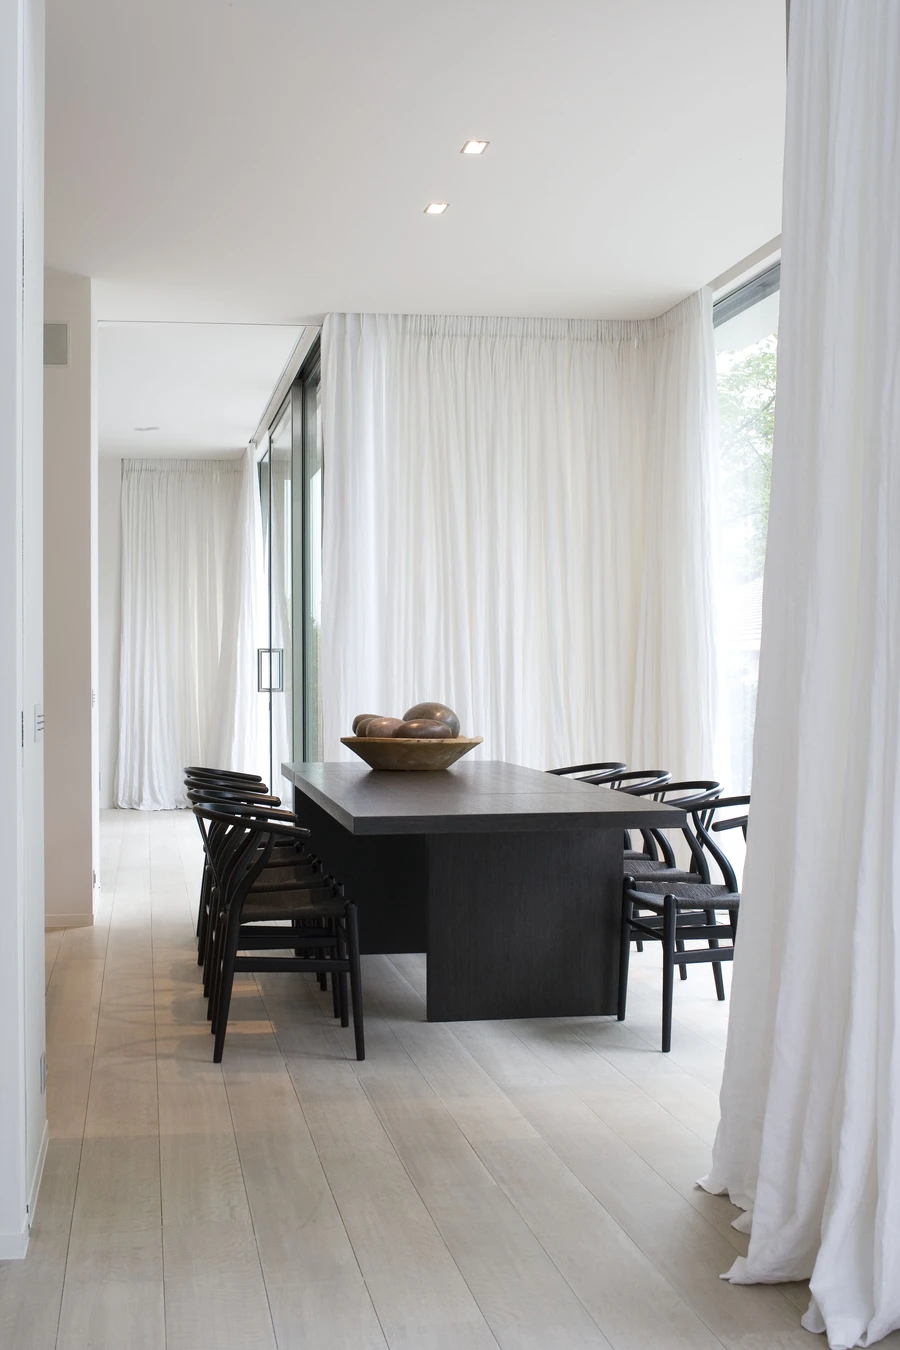 Best Of 500 Contemporary Interiors In 2020 Luxury Dining Room Modern Dining Room Interior